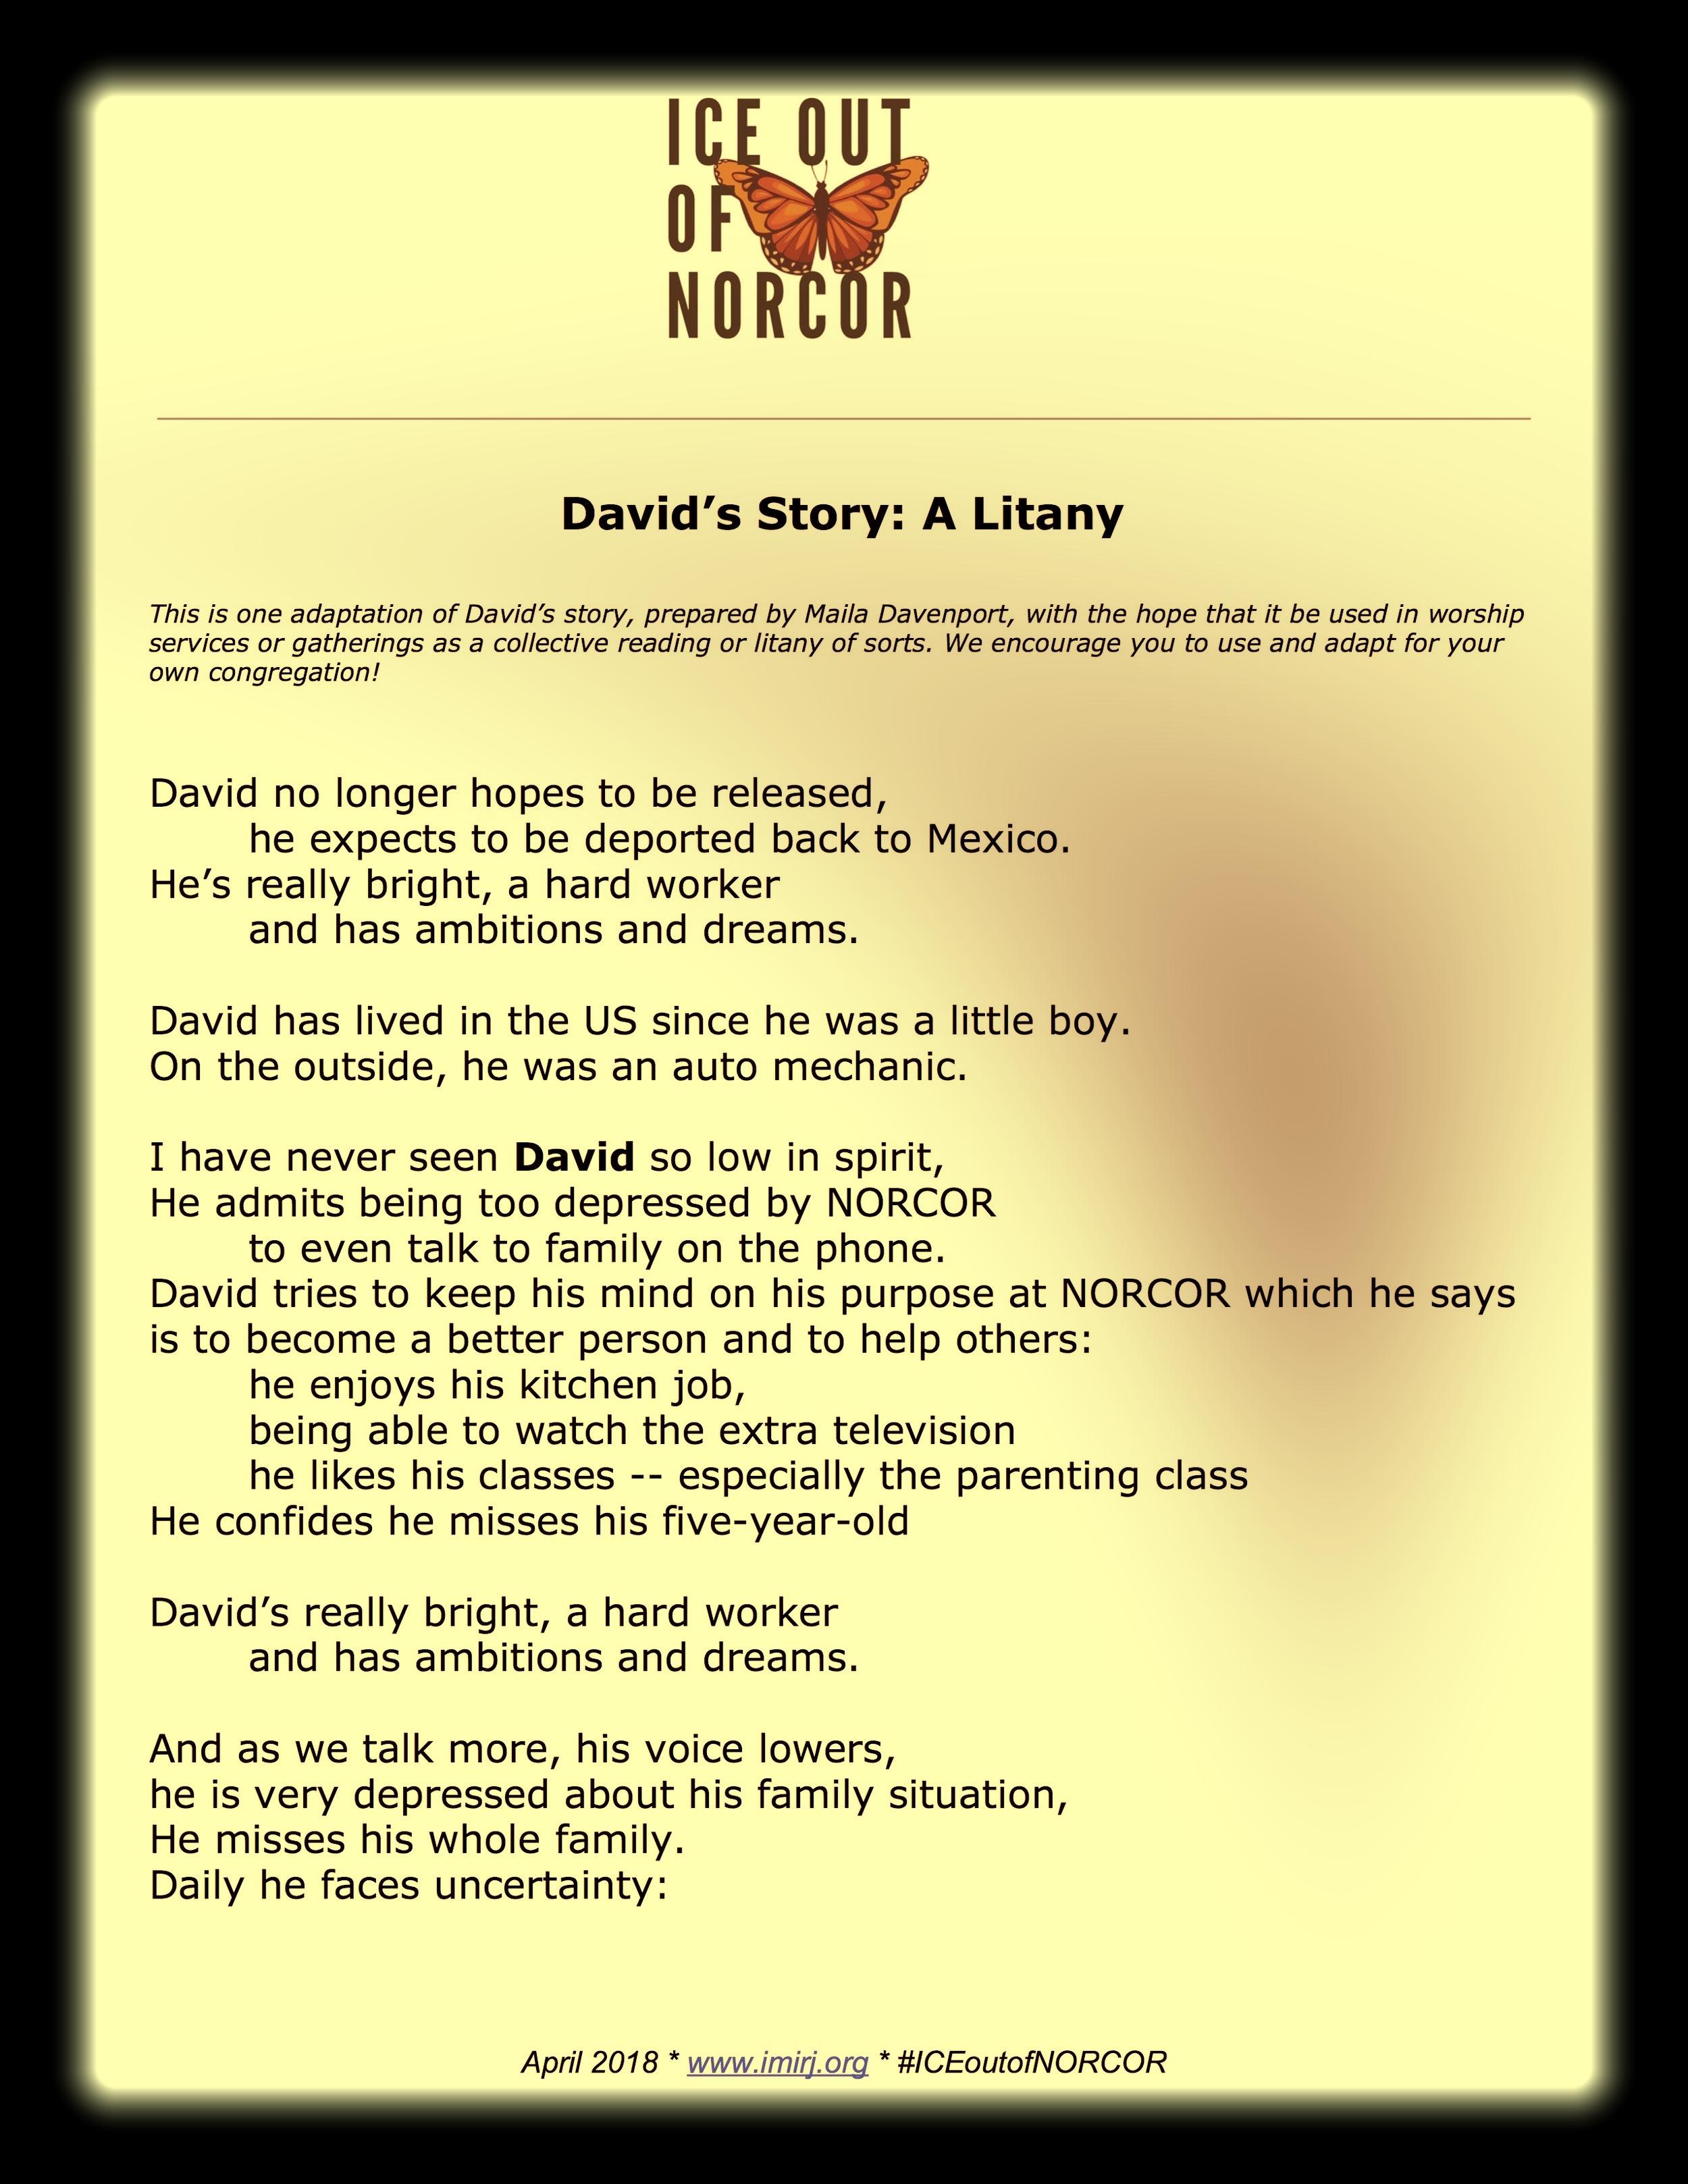 David's Story: A Litany